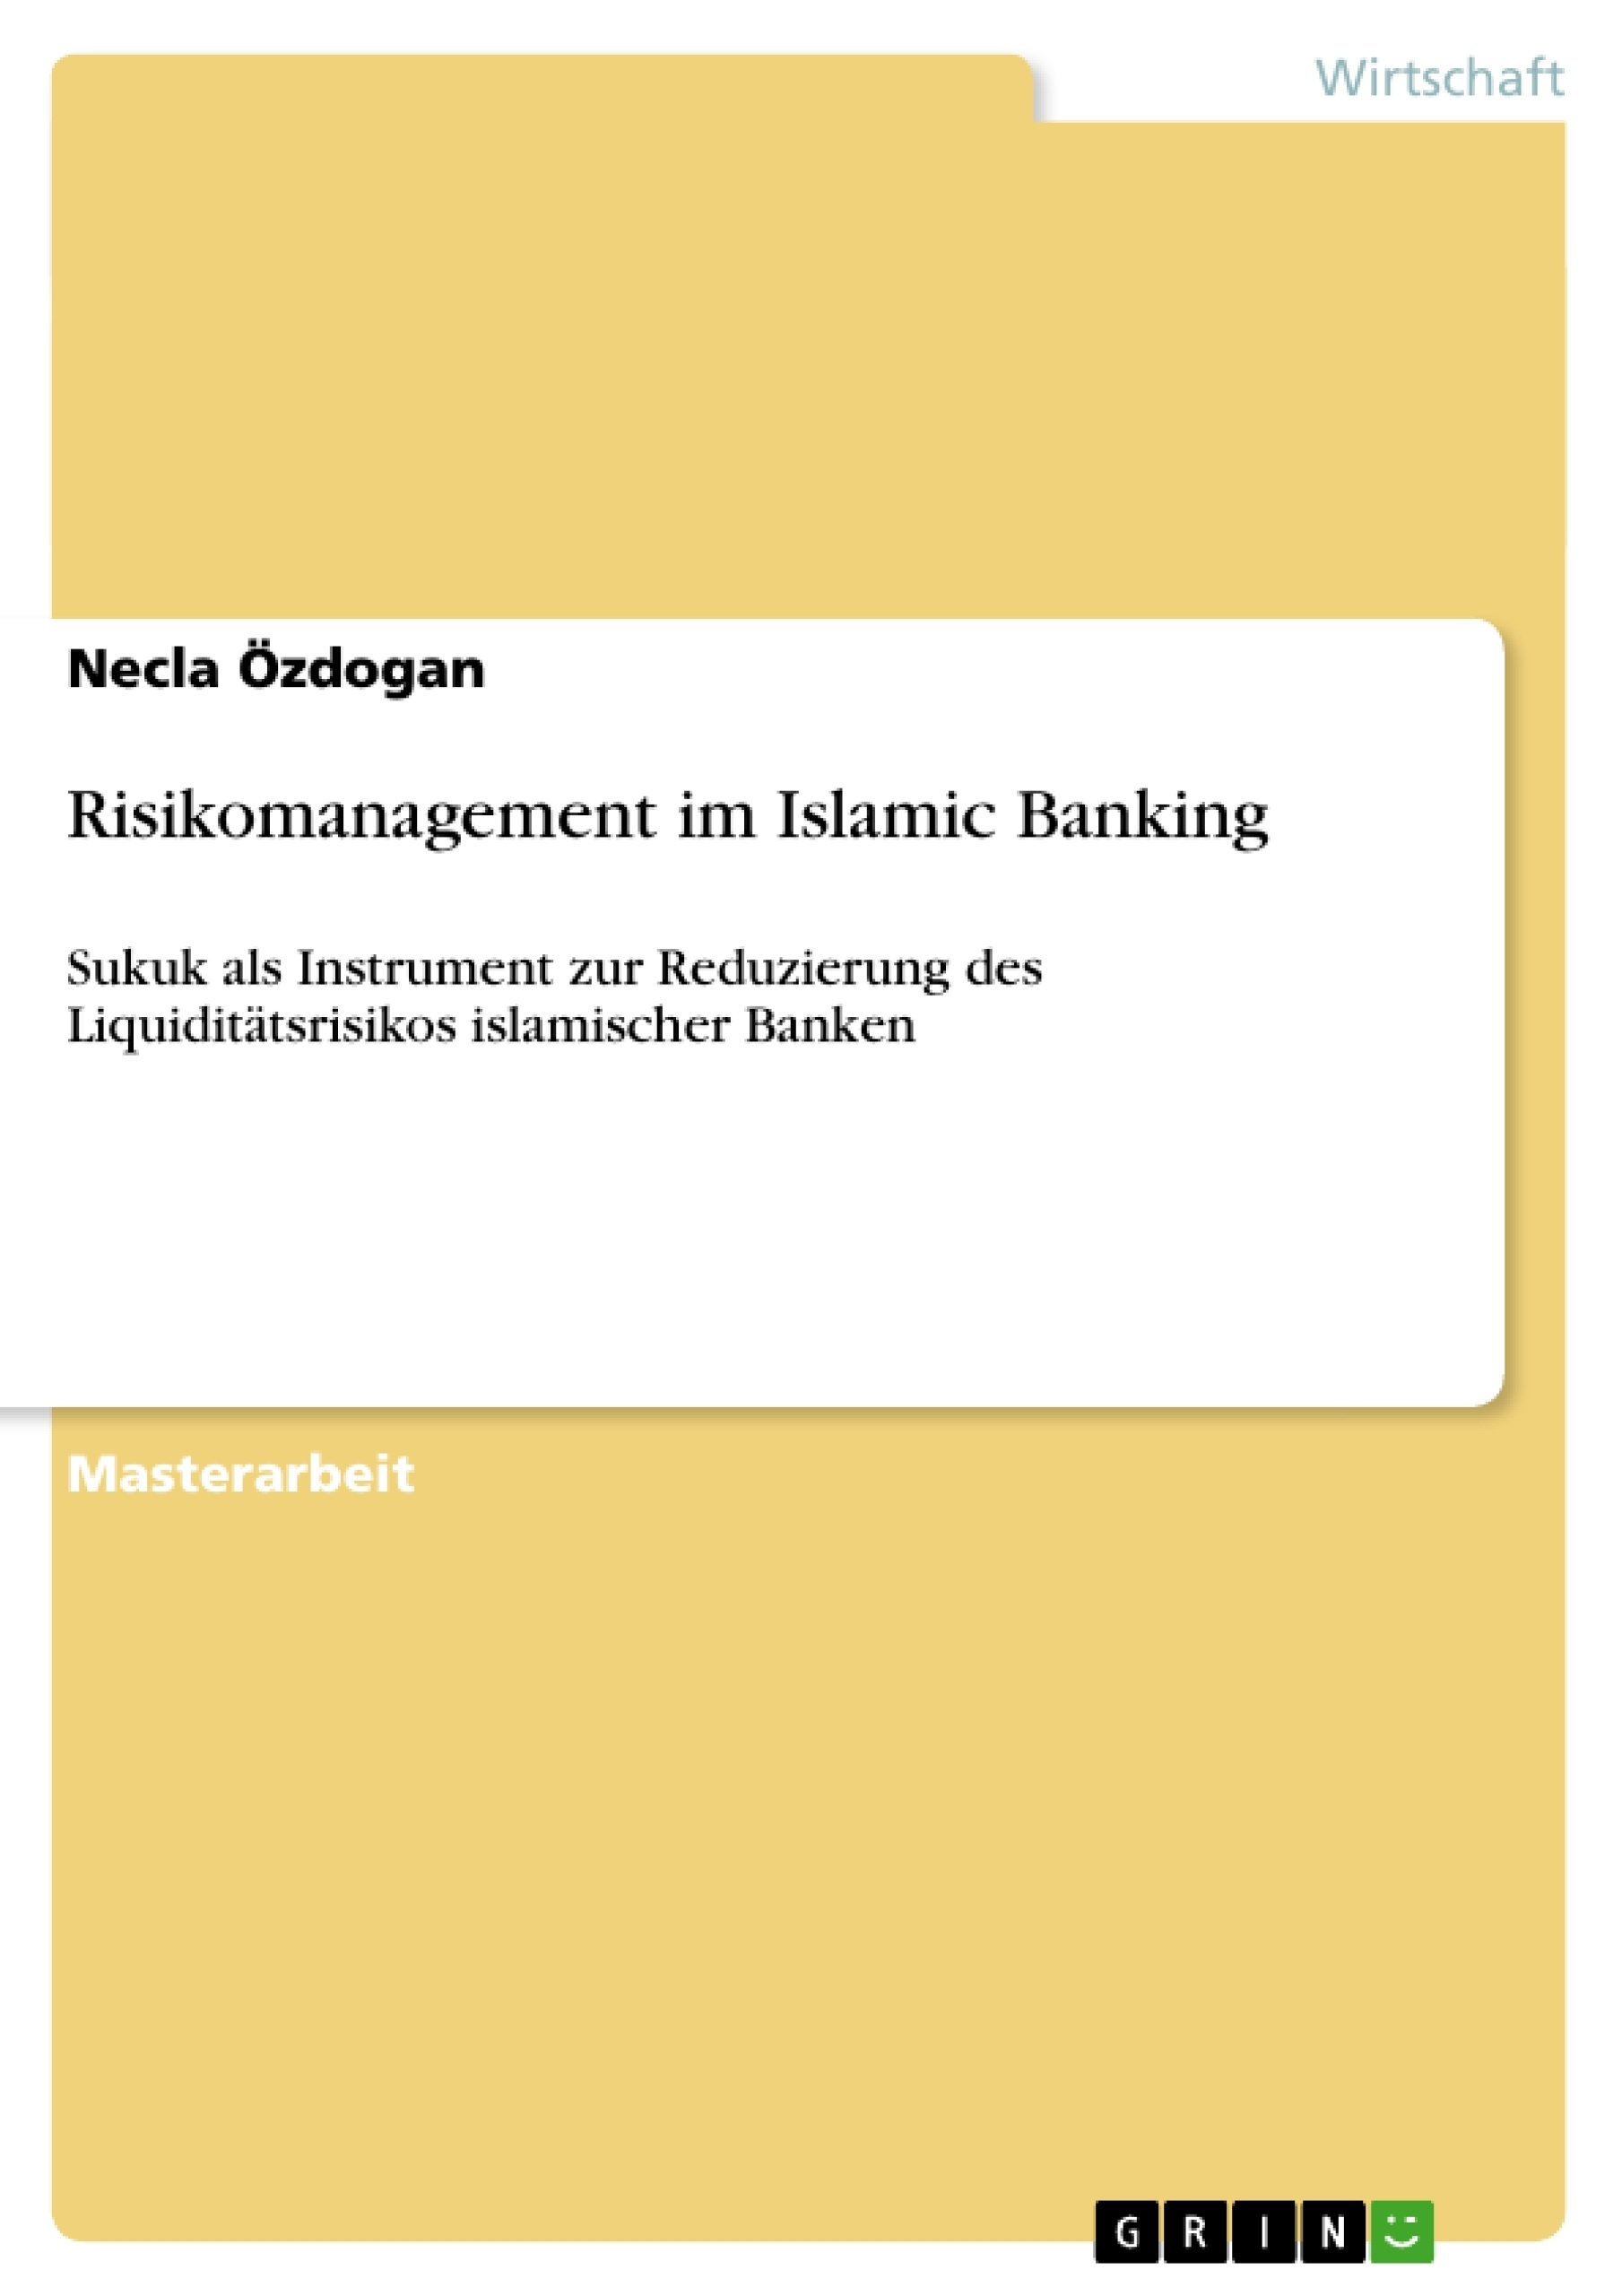 Titel: Risikomanagement im Islamic Banking